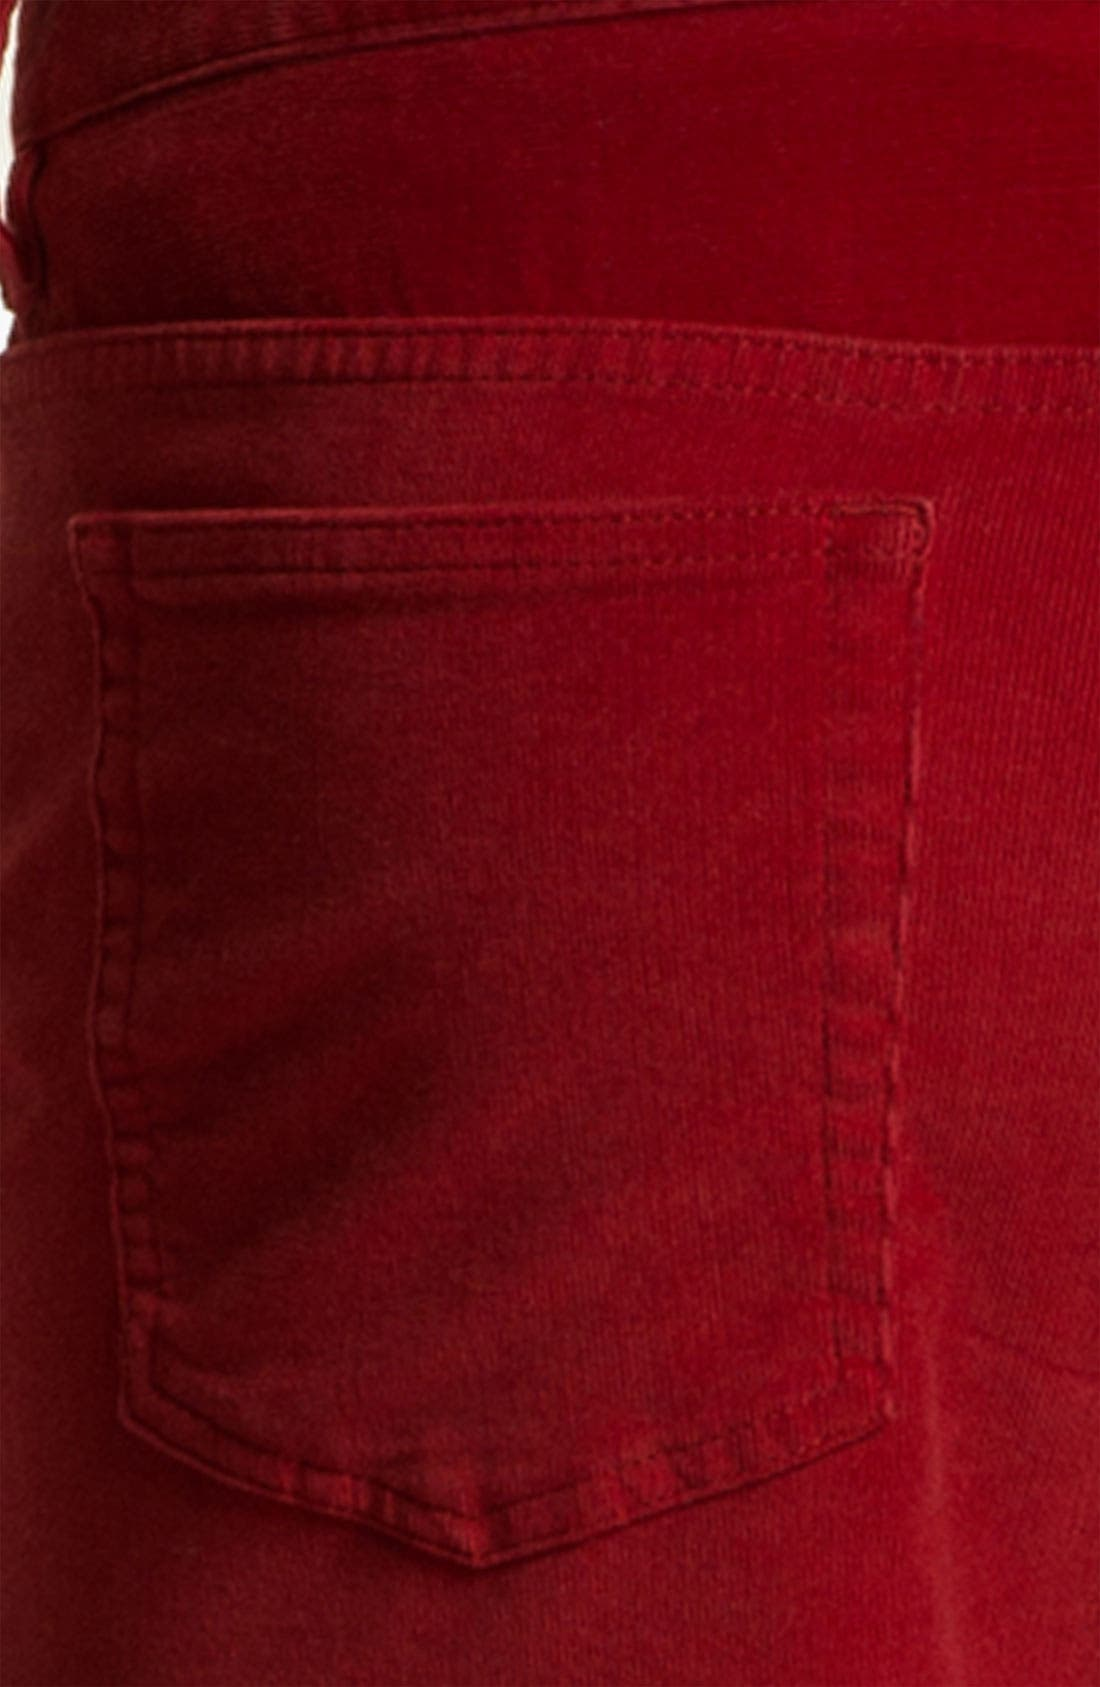 Alternate Image 3  - MARC BY MARC JACOBS Slim Straight Leg Corduroy Pants